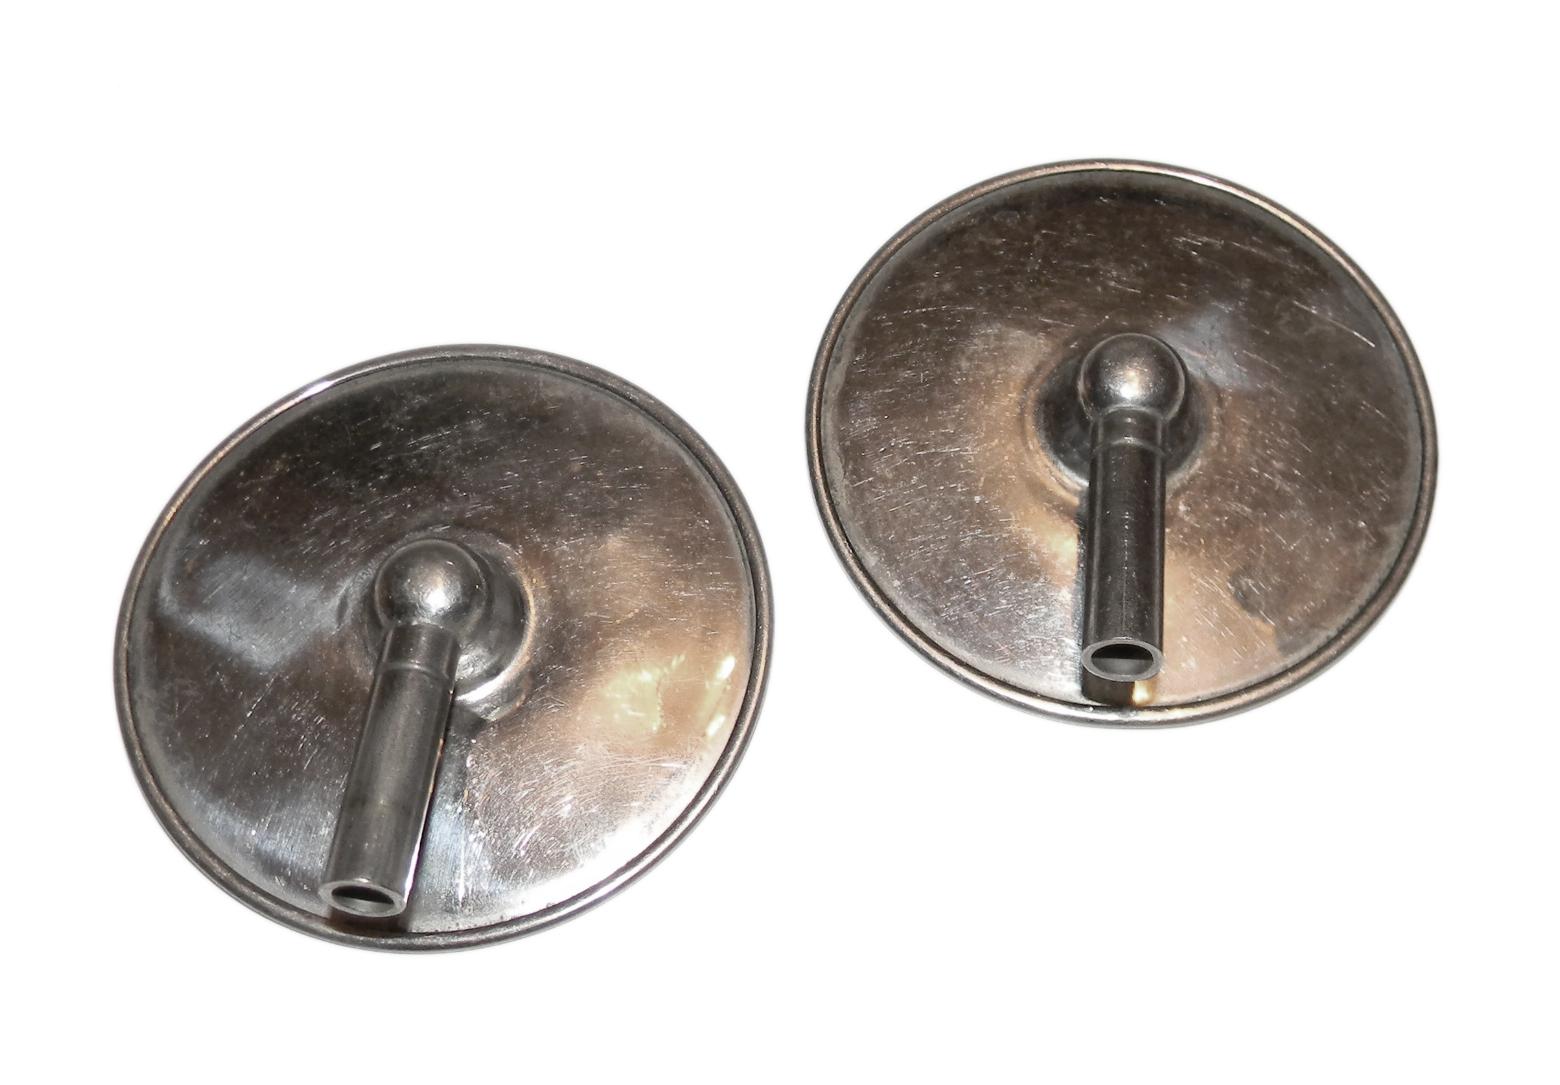 1920s-30s Gosport receivers